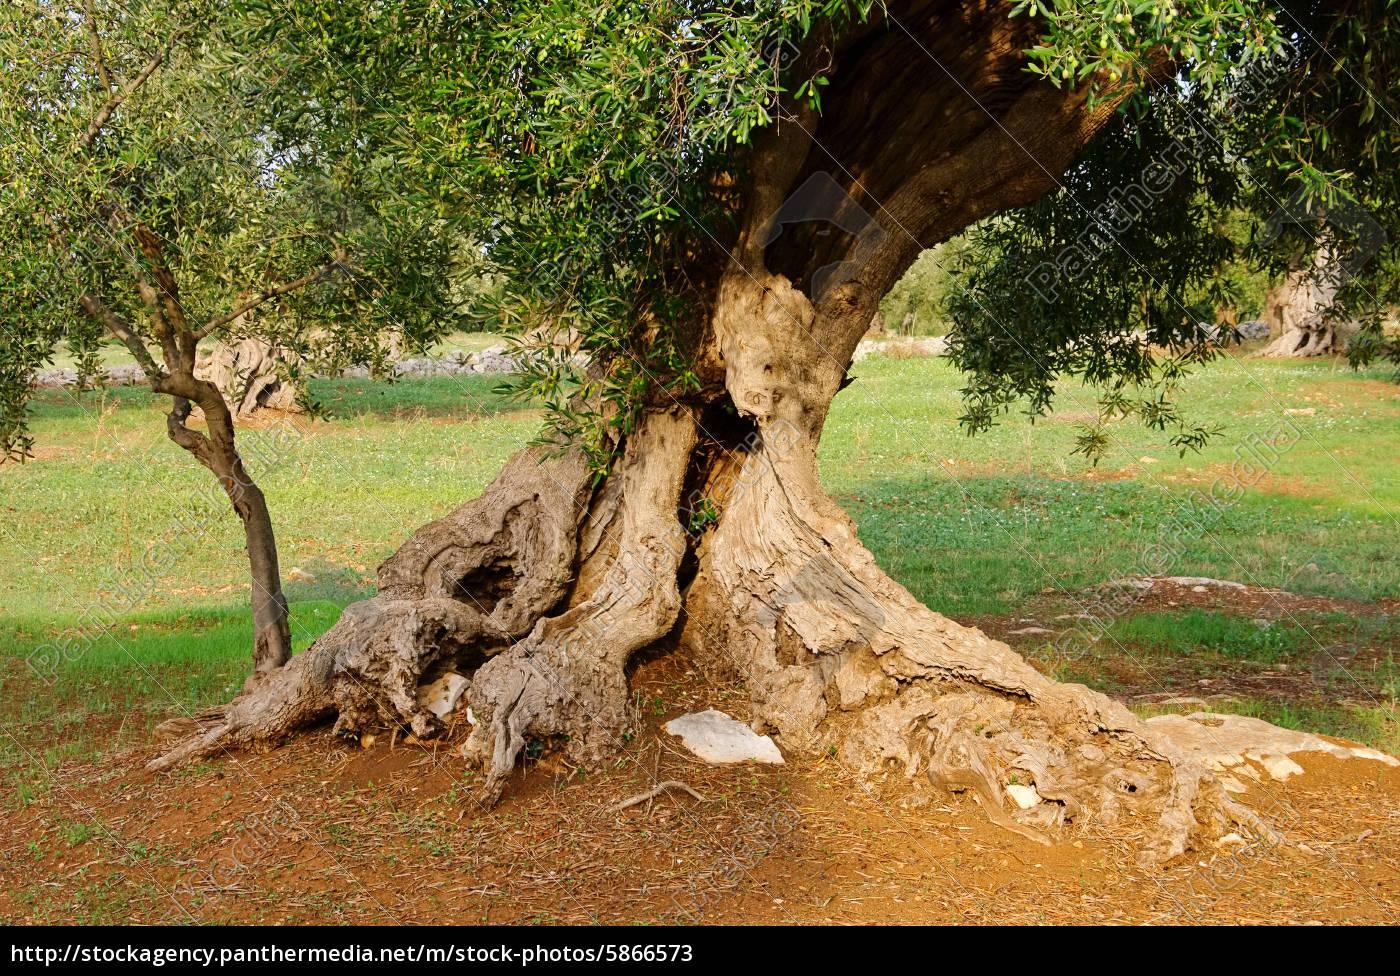 Lizenzfreies Bild 5866573 - Olivenbaum Stamm olive tree trunk 17